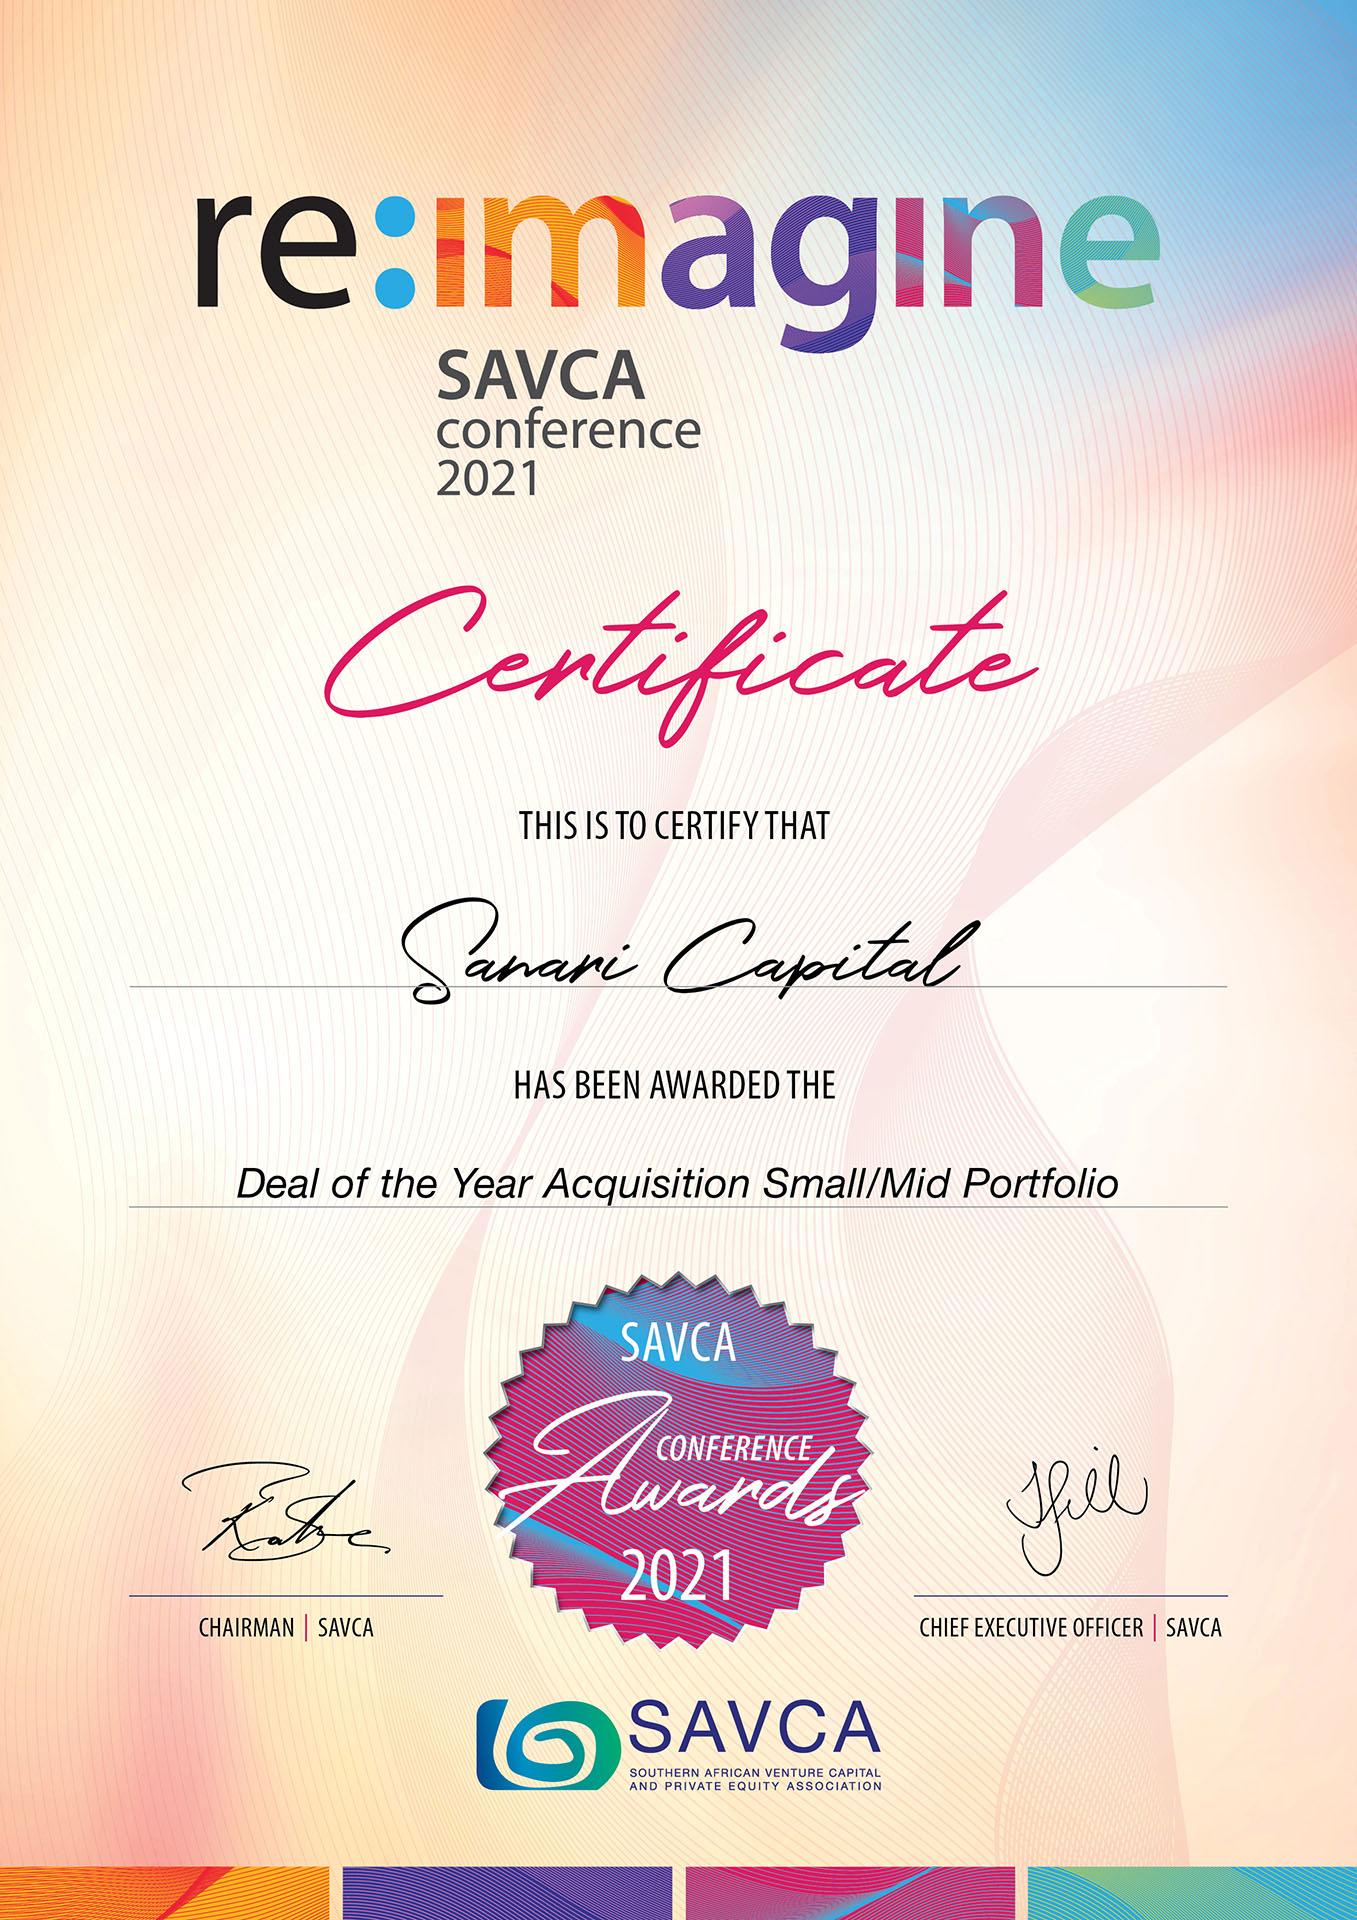 SAVCA-Conference-Award-2021-Winner-Sanari-Capital